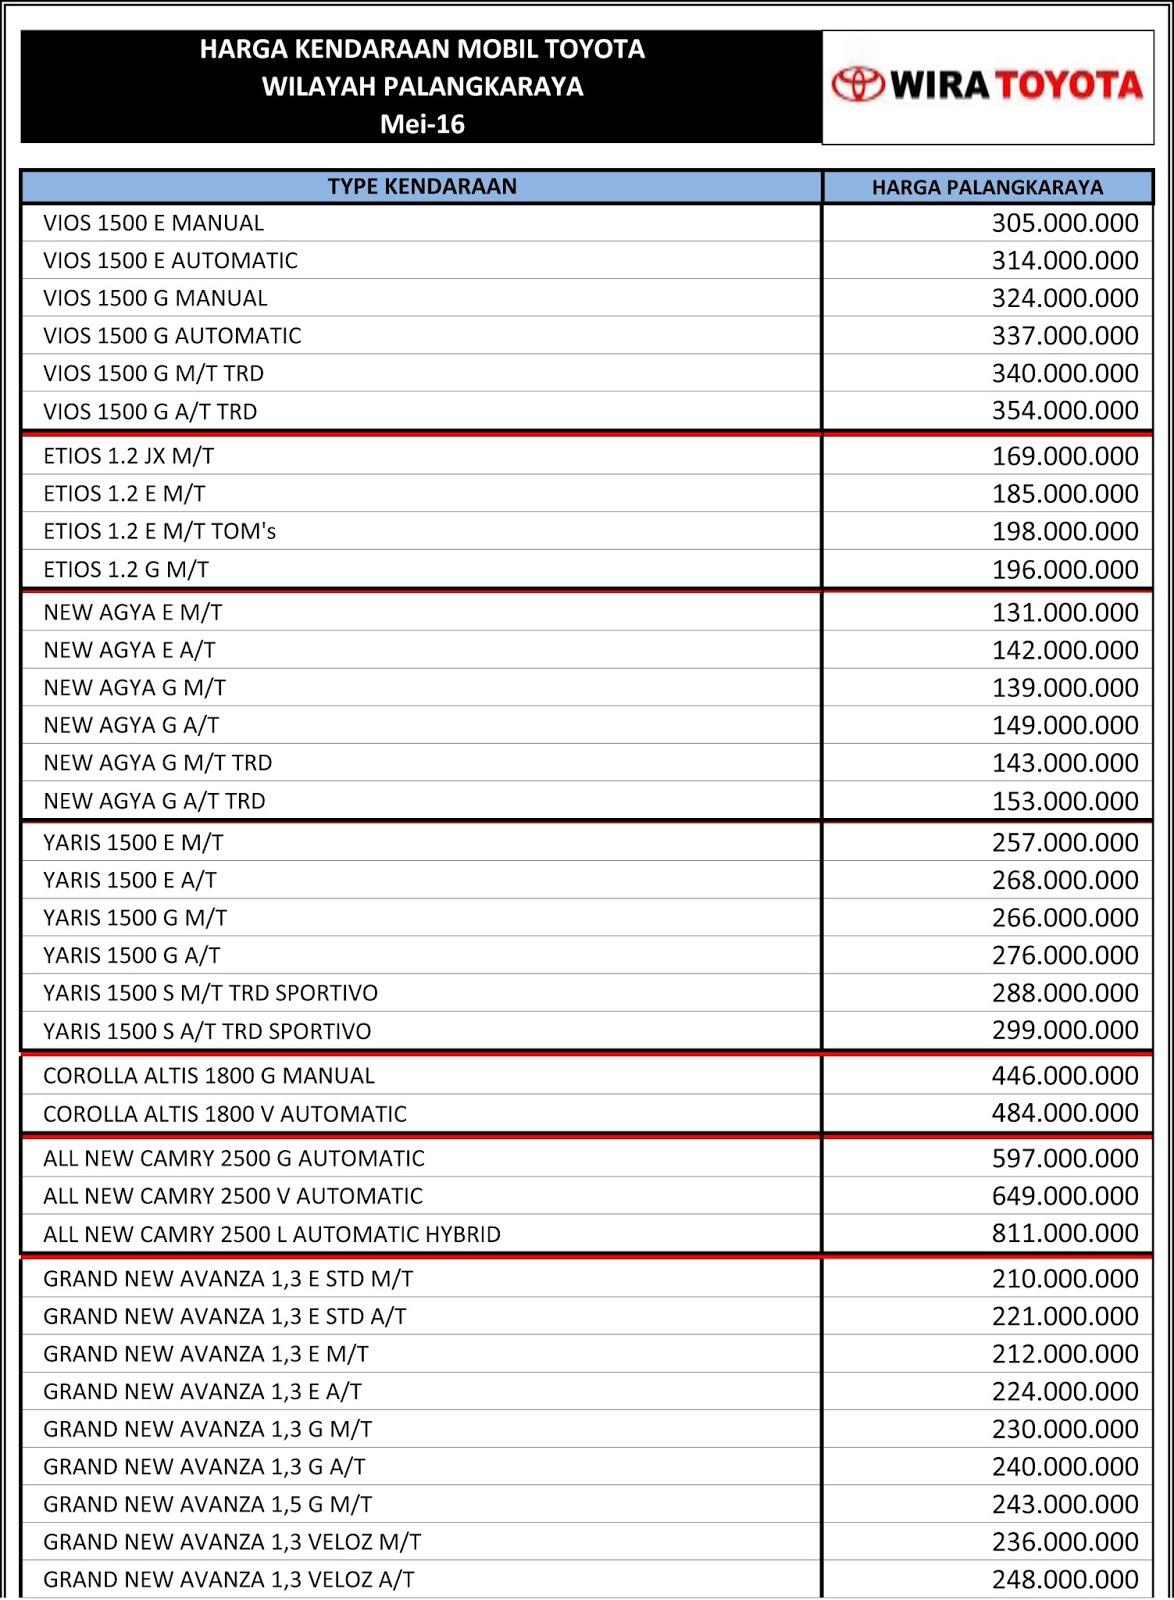 Harga Grand New Avanza 2017 Jogja Toyota 2016 Sewa Mobil All Per Jam Cuma Rp 50 000 Wira Palangkaraya Innova Fortuner Yaris